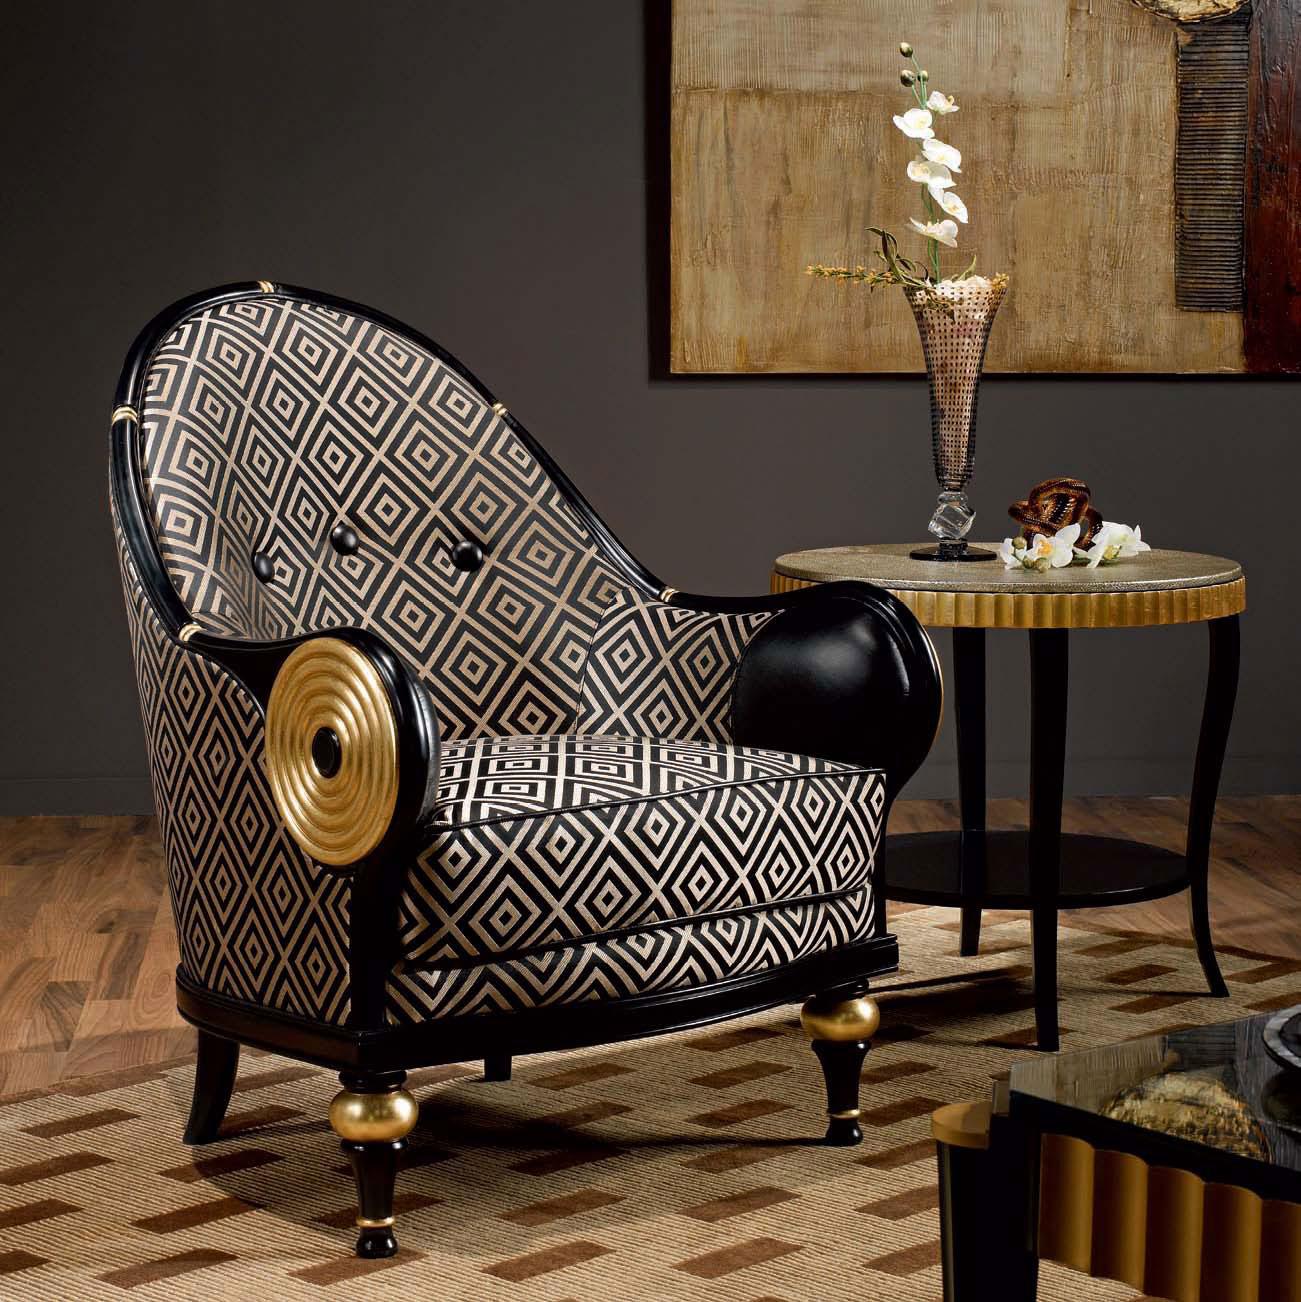 Buy Furniture OnLine · Luxury Hotel ... Luxury Hotel Furniture